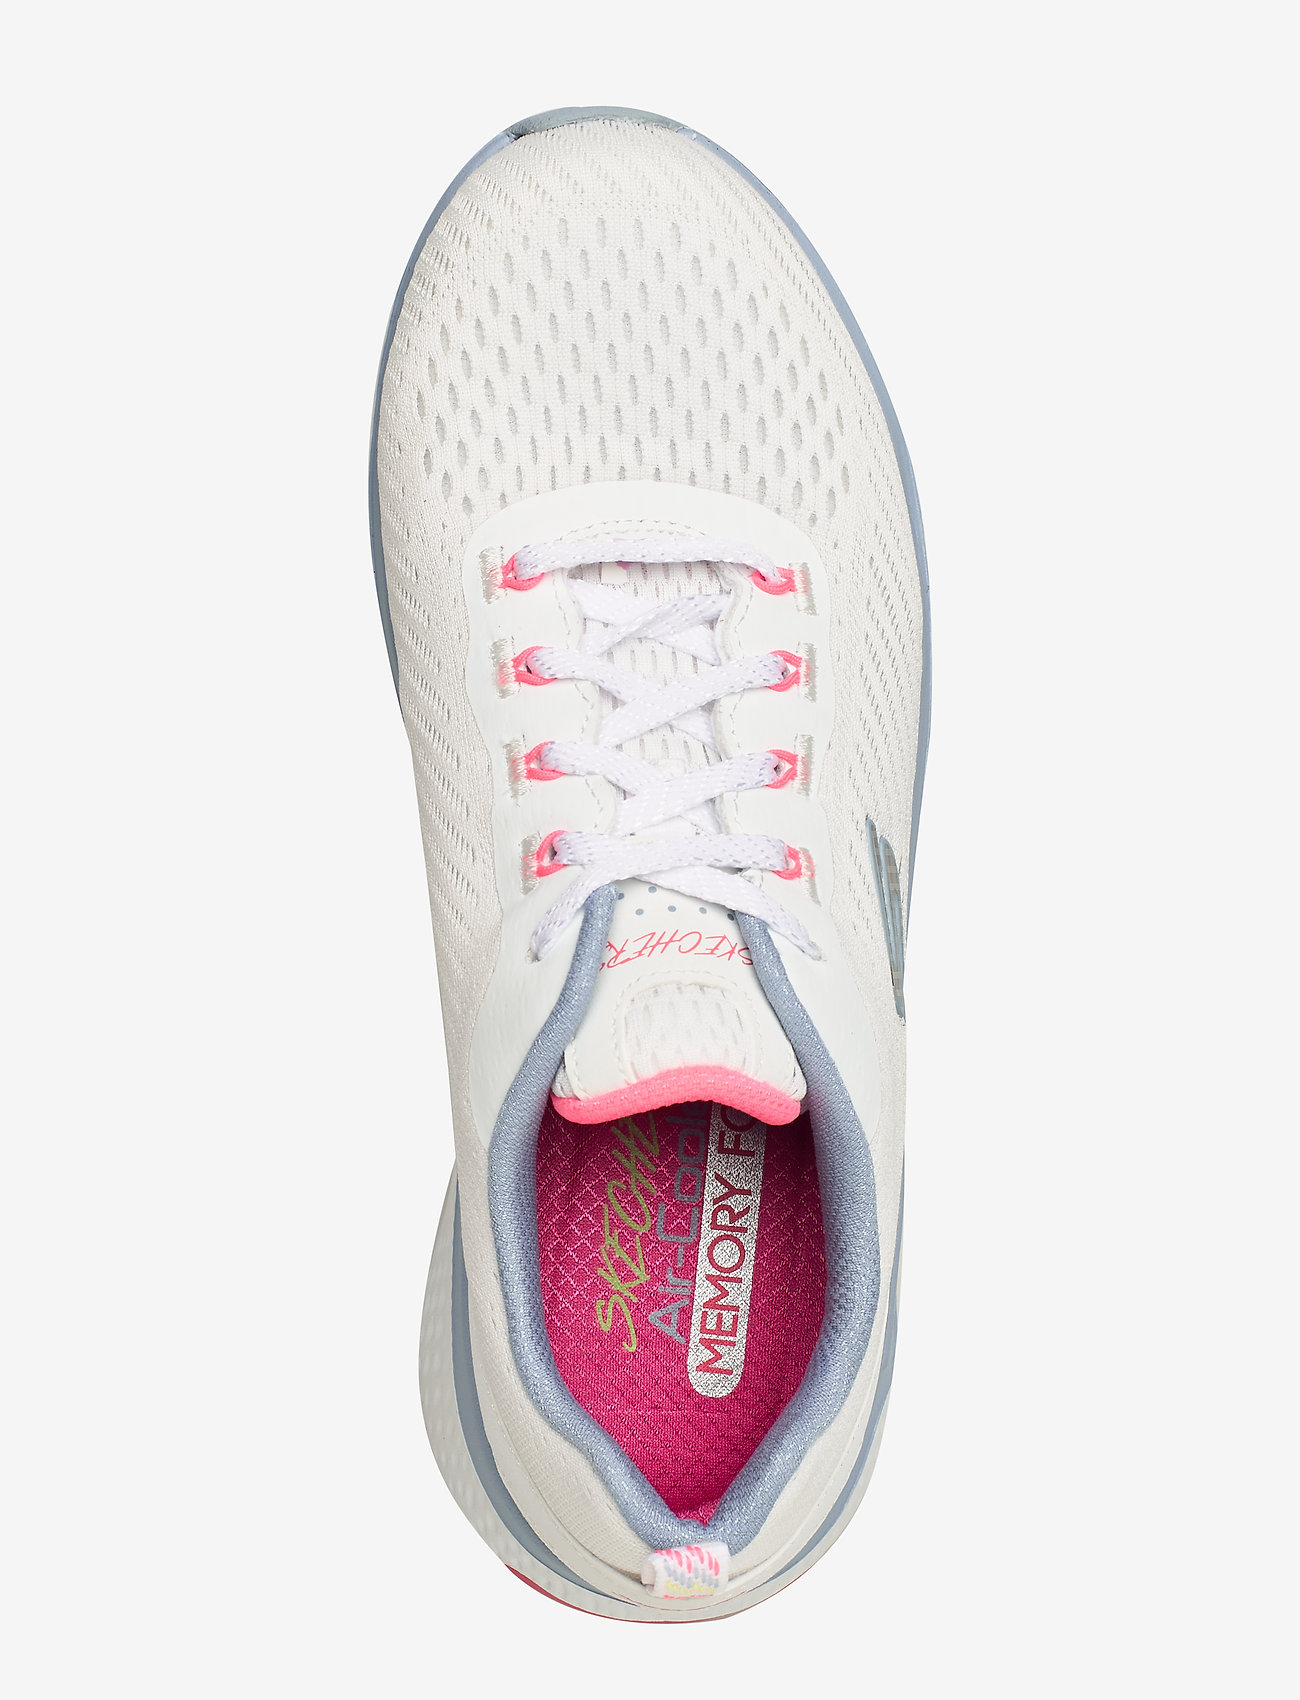 Womens Solar Fuse (Wblp White Blue Pink) - Skechers